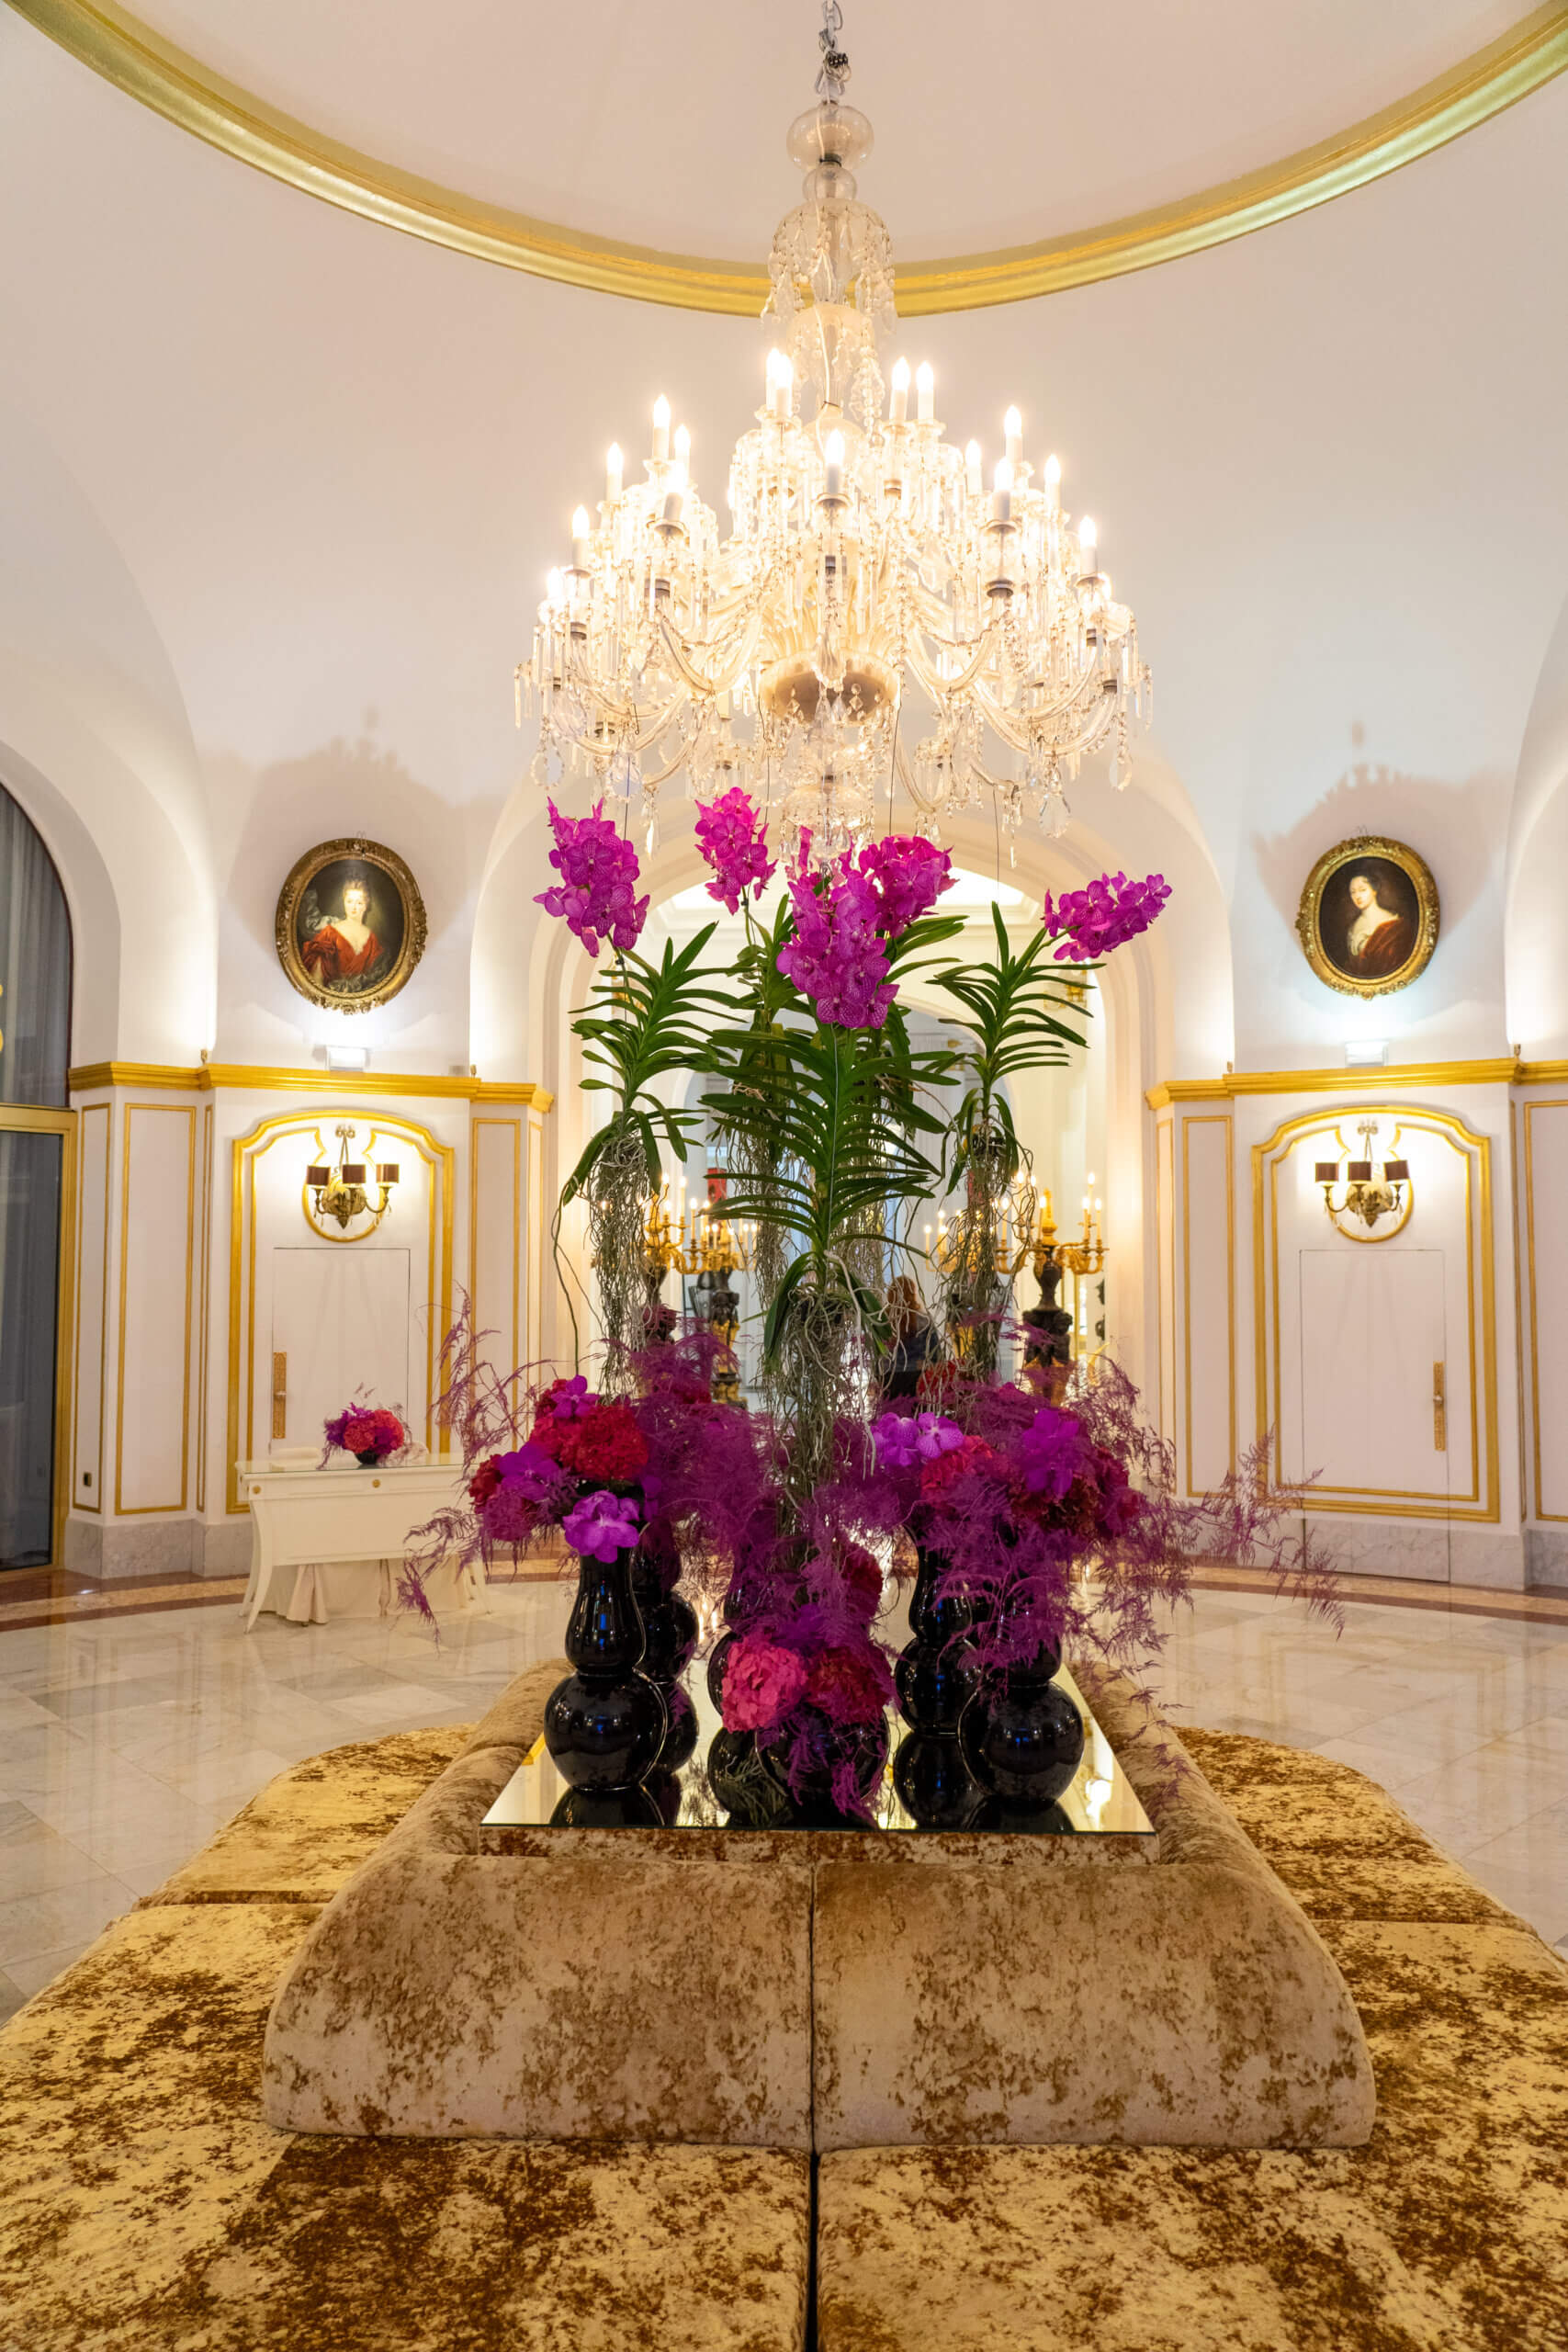 Lobby des Hotel Le Negresco in Nizza